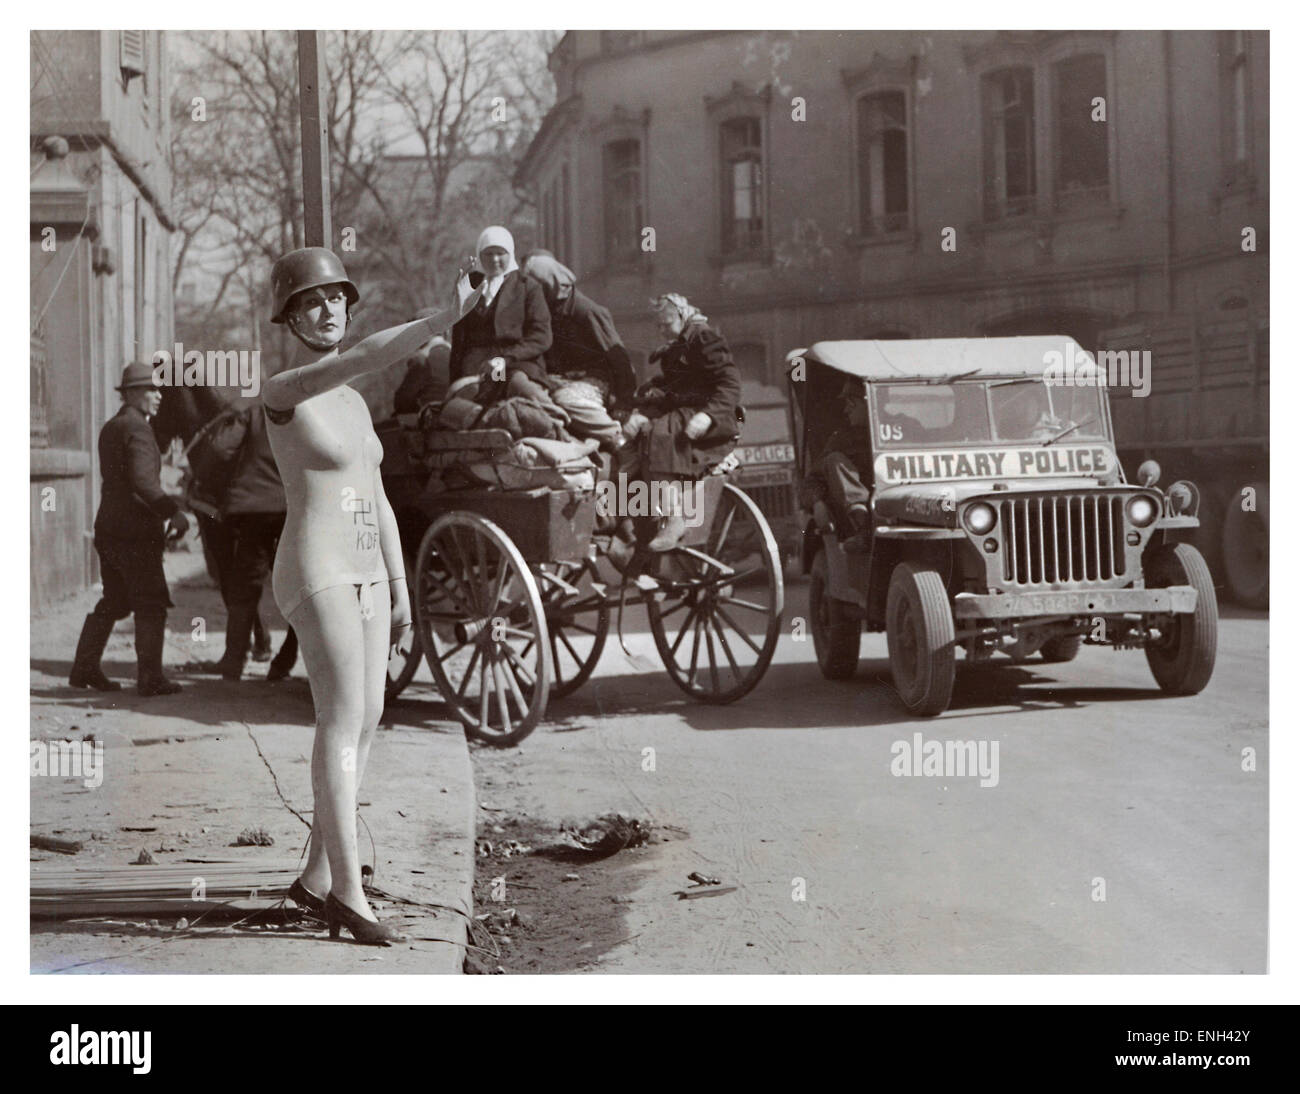 OCCUPIED BERLIN WW2 Dark humour image in post war 1945 Berlin of helmeted shop mannequin giving Hitler salute with - Stock Image